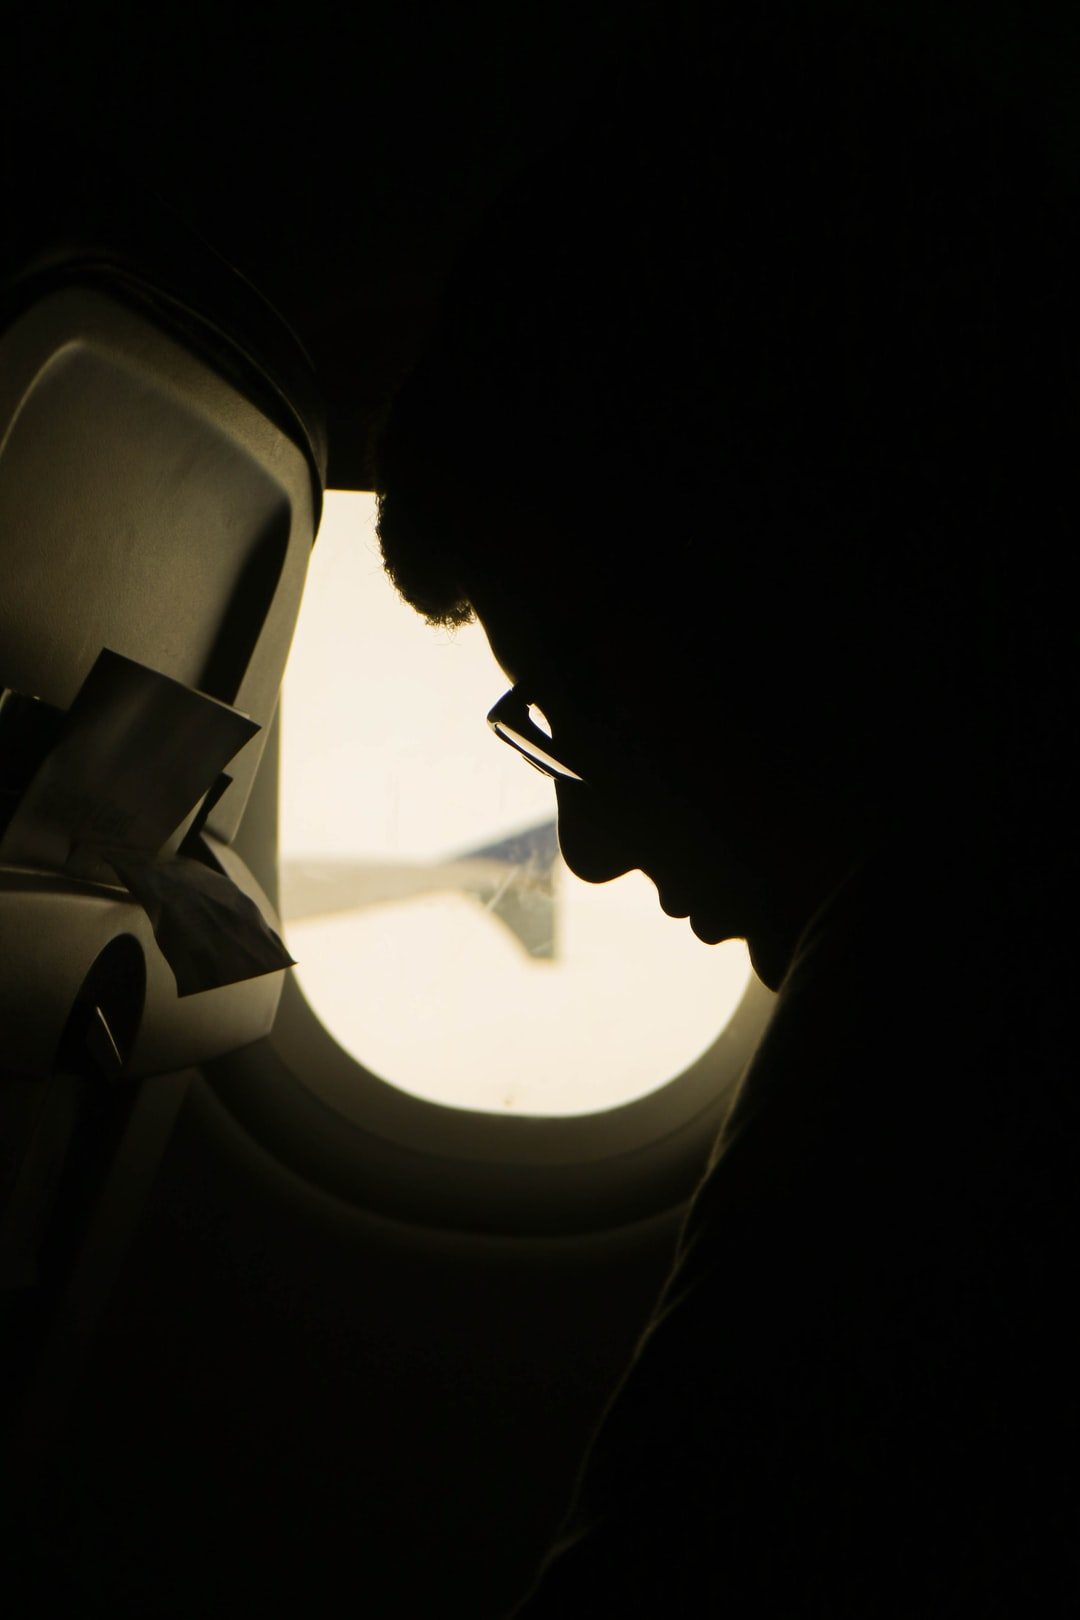 Homesick, Depressed boy thinking on an airplane (Model Credit: Adam Wright)